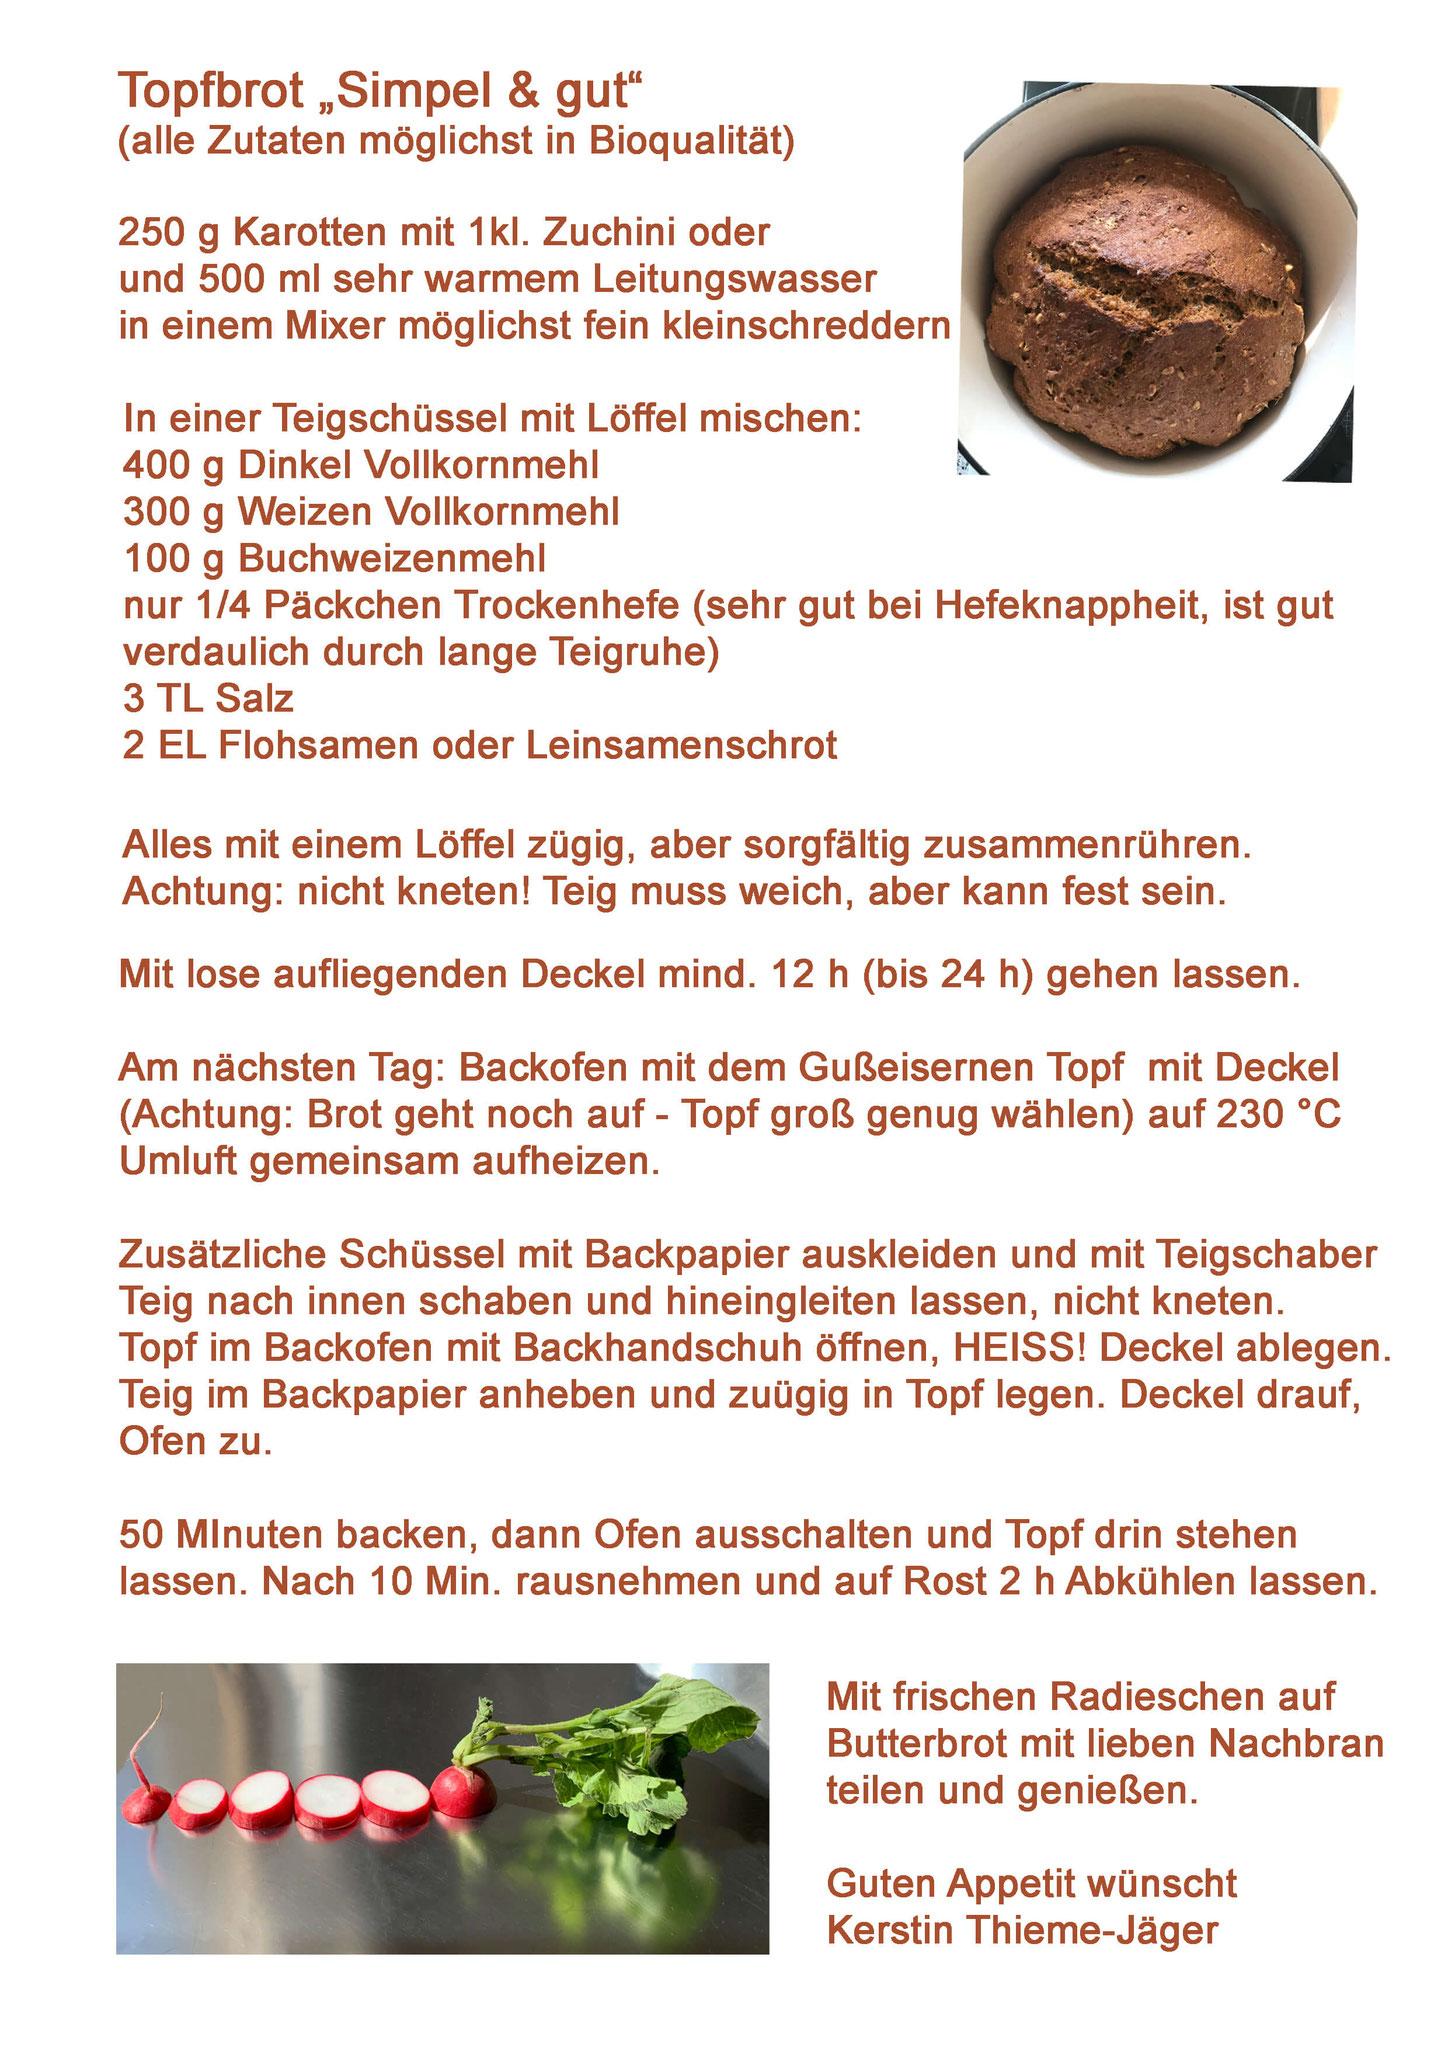 17b_Topfbrot-Rezept, Thieme-Jäger